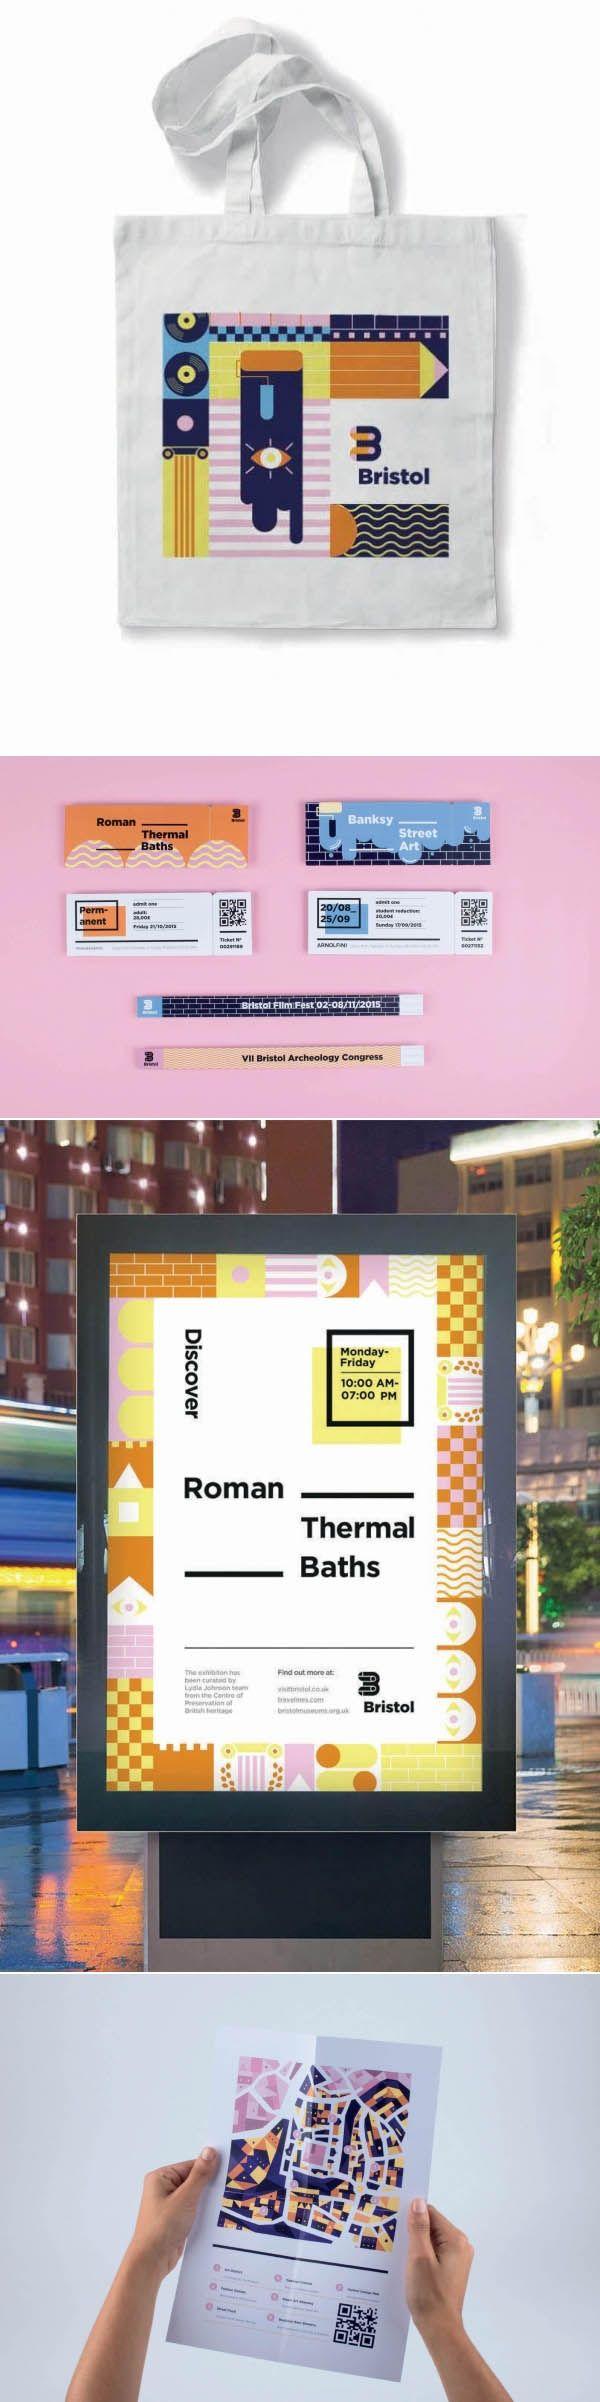 Branding by Bianca Oggiano, Shillington Graduate. More student work --> http://www.shillingtoncollege.com.au/graphic-design-course/student-work #shillington #shillobri #branding #bristol #pattern